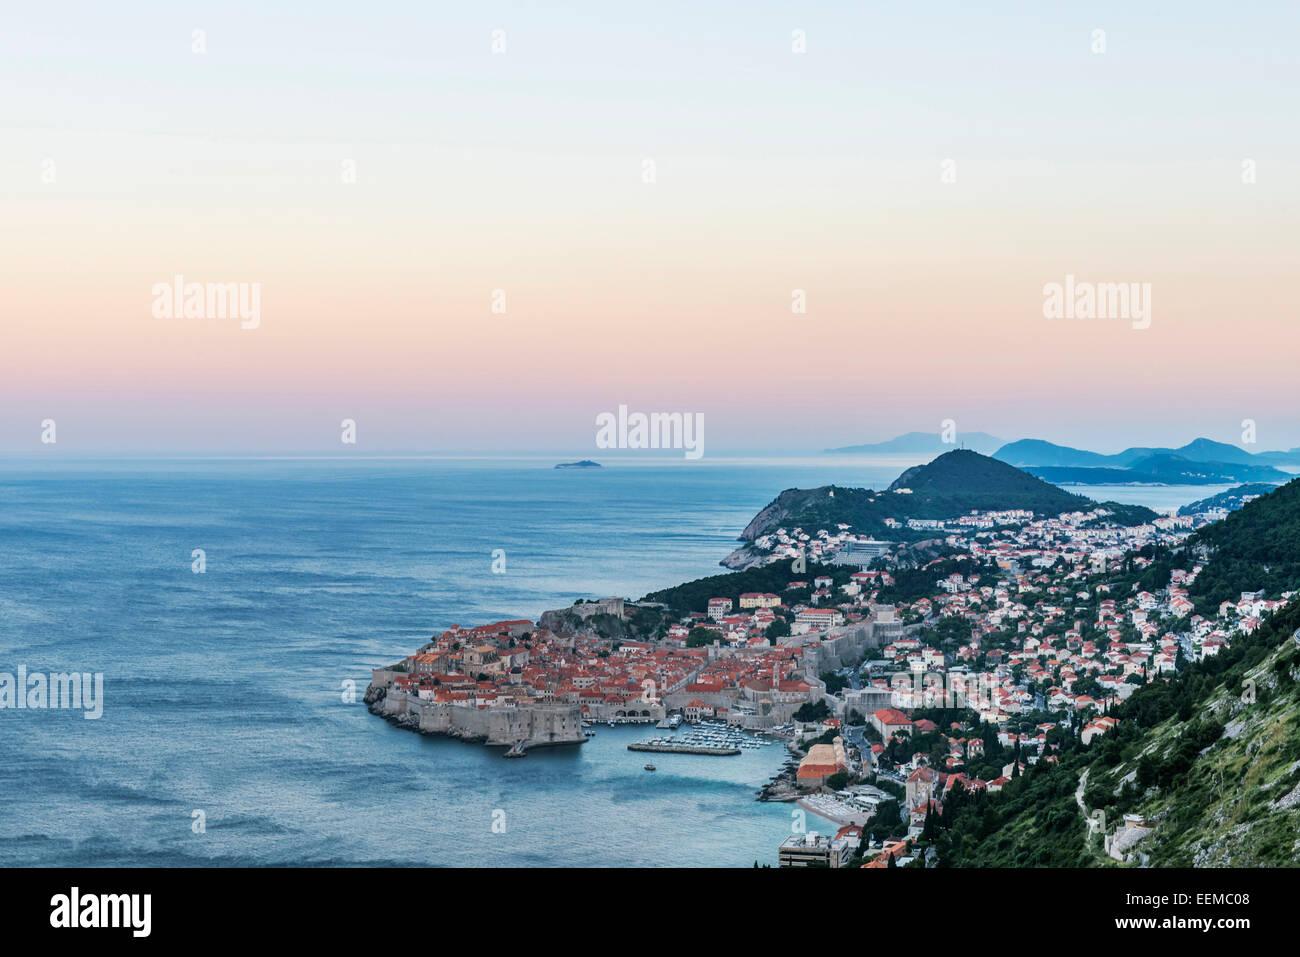 Aerial view of coastal city on hillside, Dubrovnik, Dubrovnik-Neretva, Croatia - Stock Image